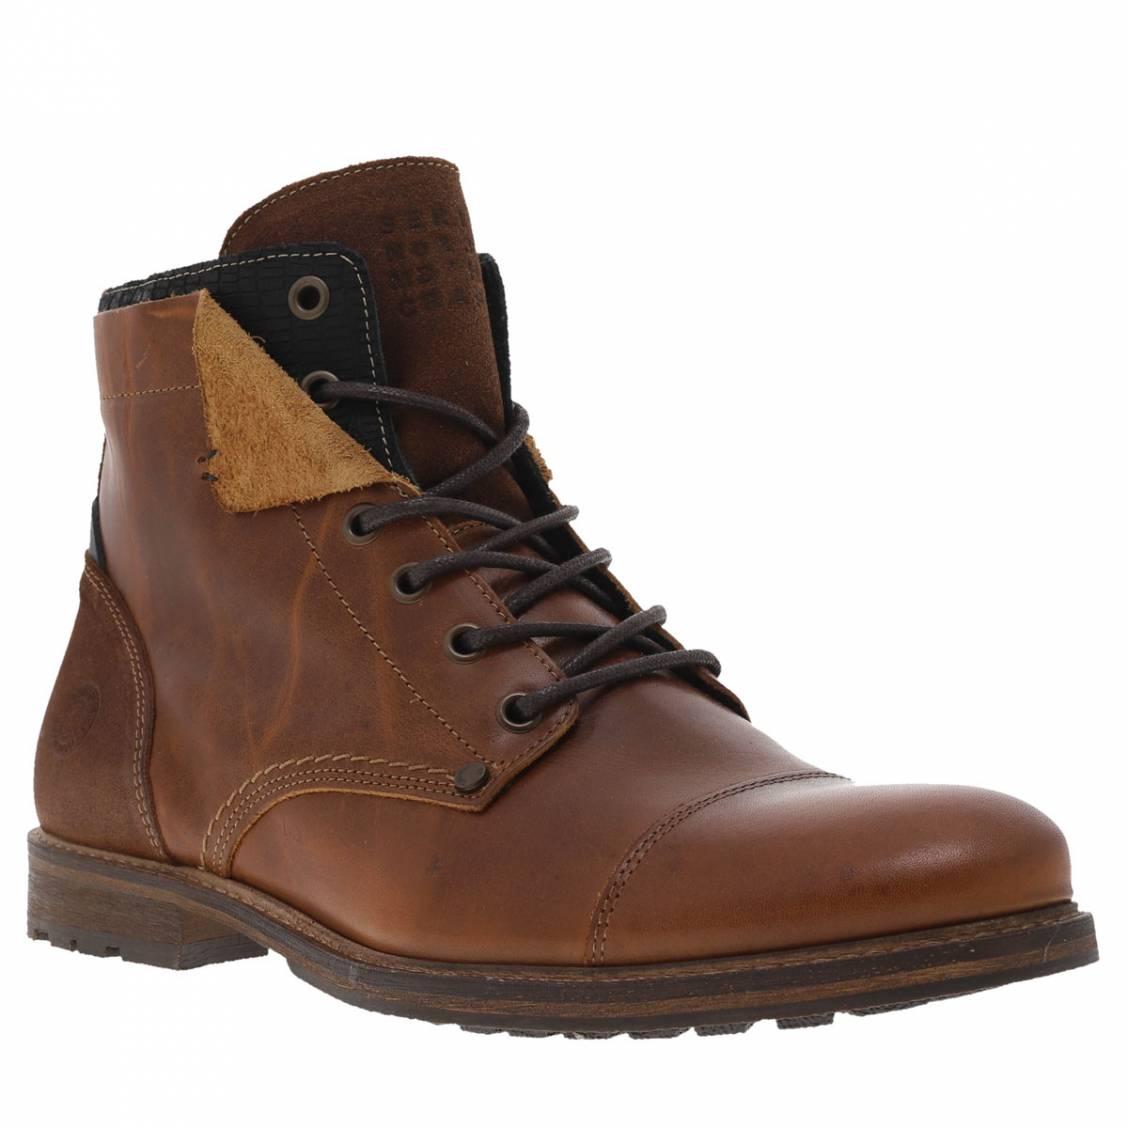 92fc45db6ae Boots hautes Bullboxer marron Boots hautes Bullboxer marron ...